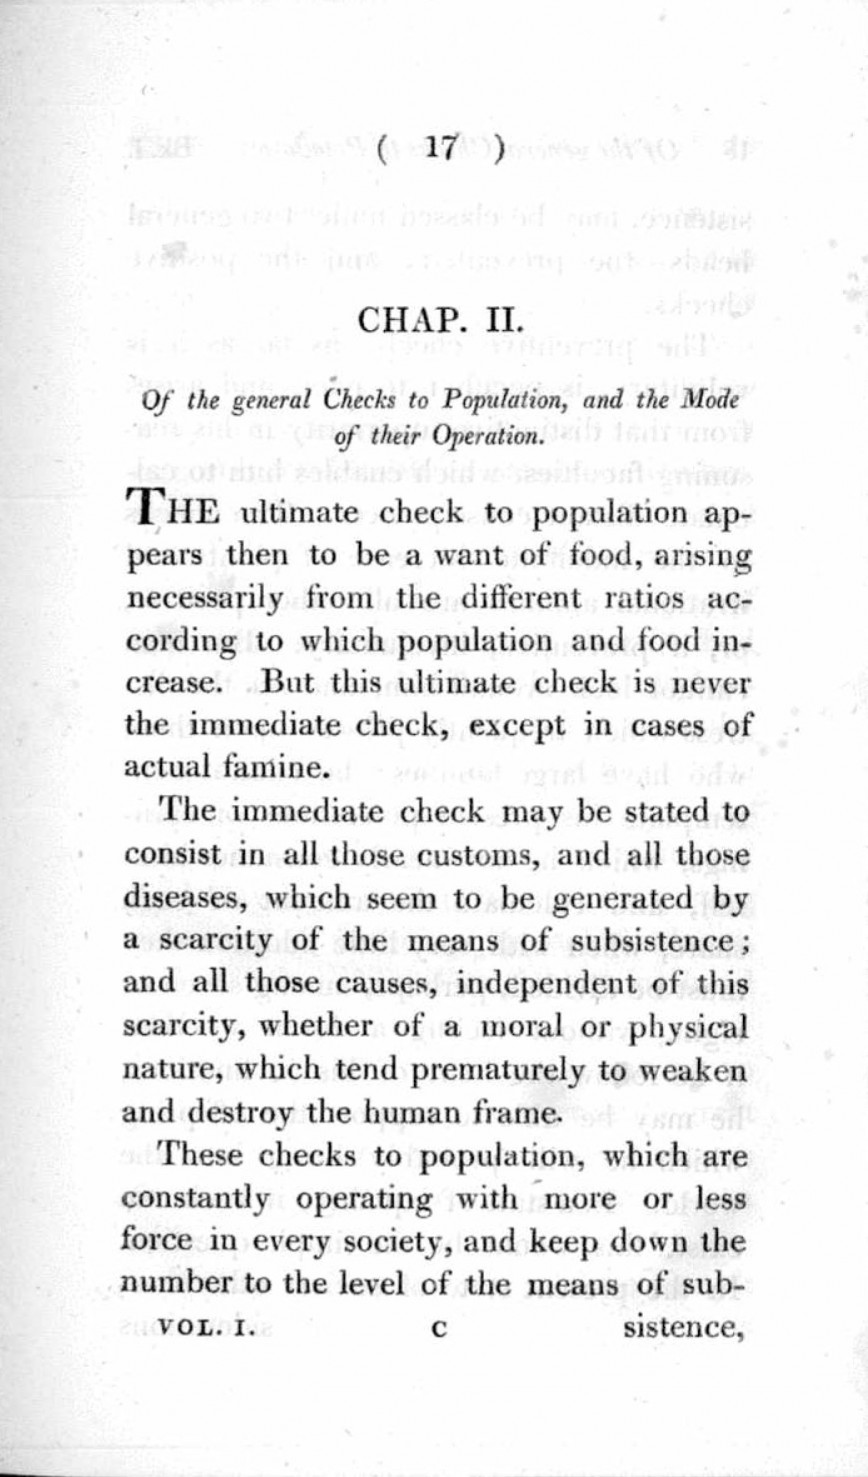 012 Essay Example On The Principle Of Singular Population Malthus Sparknotes Thomas Main Idea 868